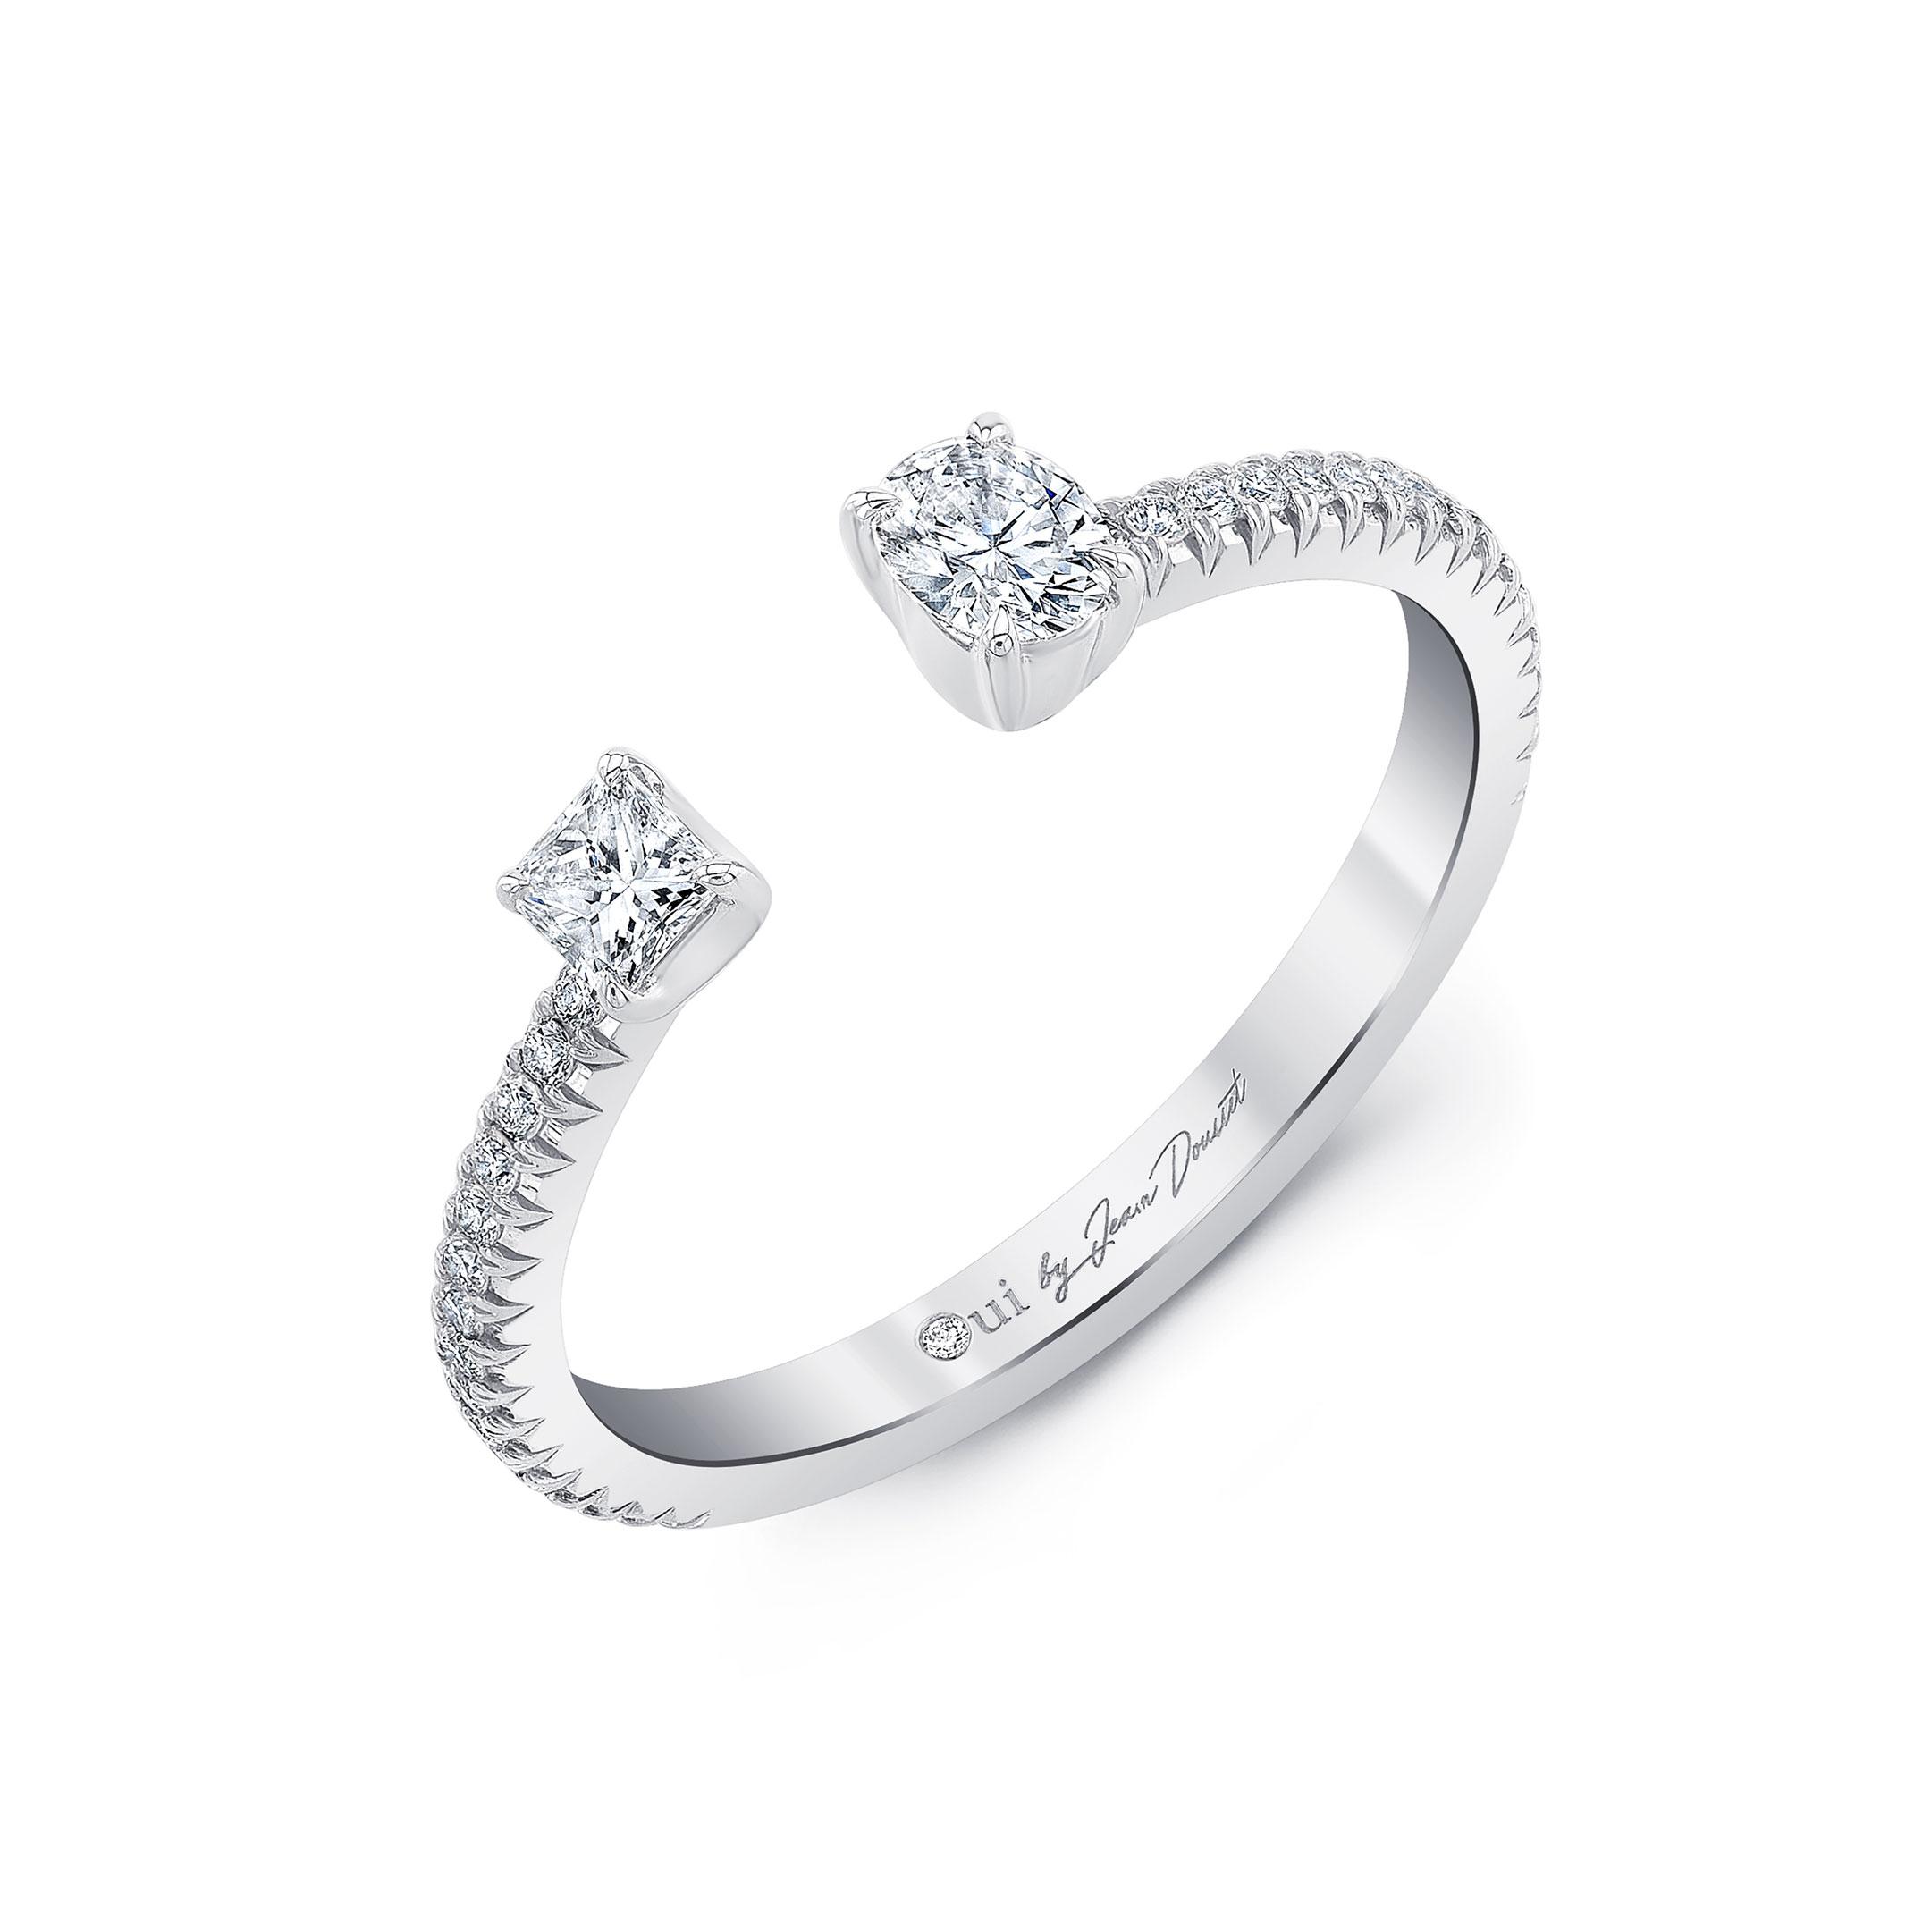 Celeste Mixed Diamond Open Pavé Ring, oval & princess in 18k White Gold Profile View by Oui by Jean Dousset